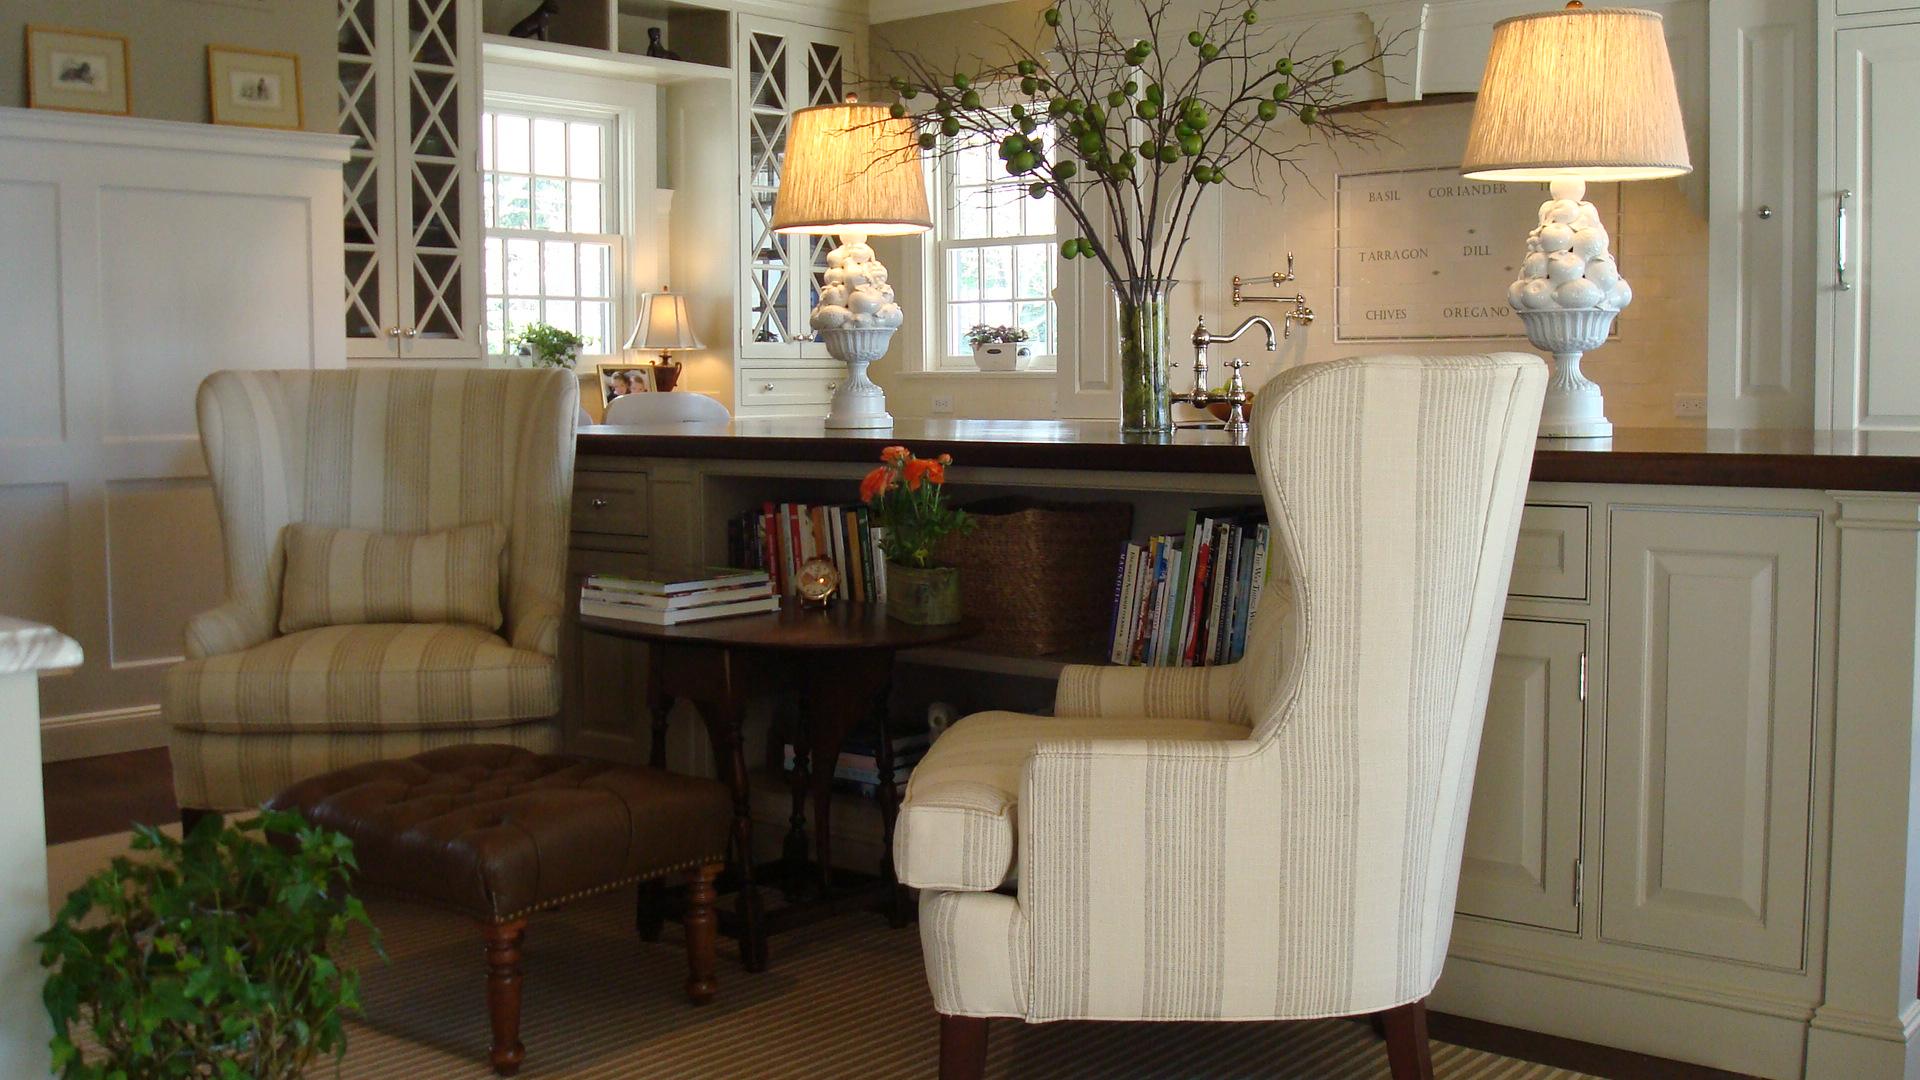 Renovation-colonial-kitchen-sitting-old-greenwich-ct-interior-w.jpg